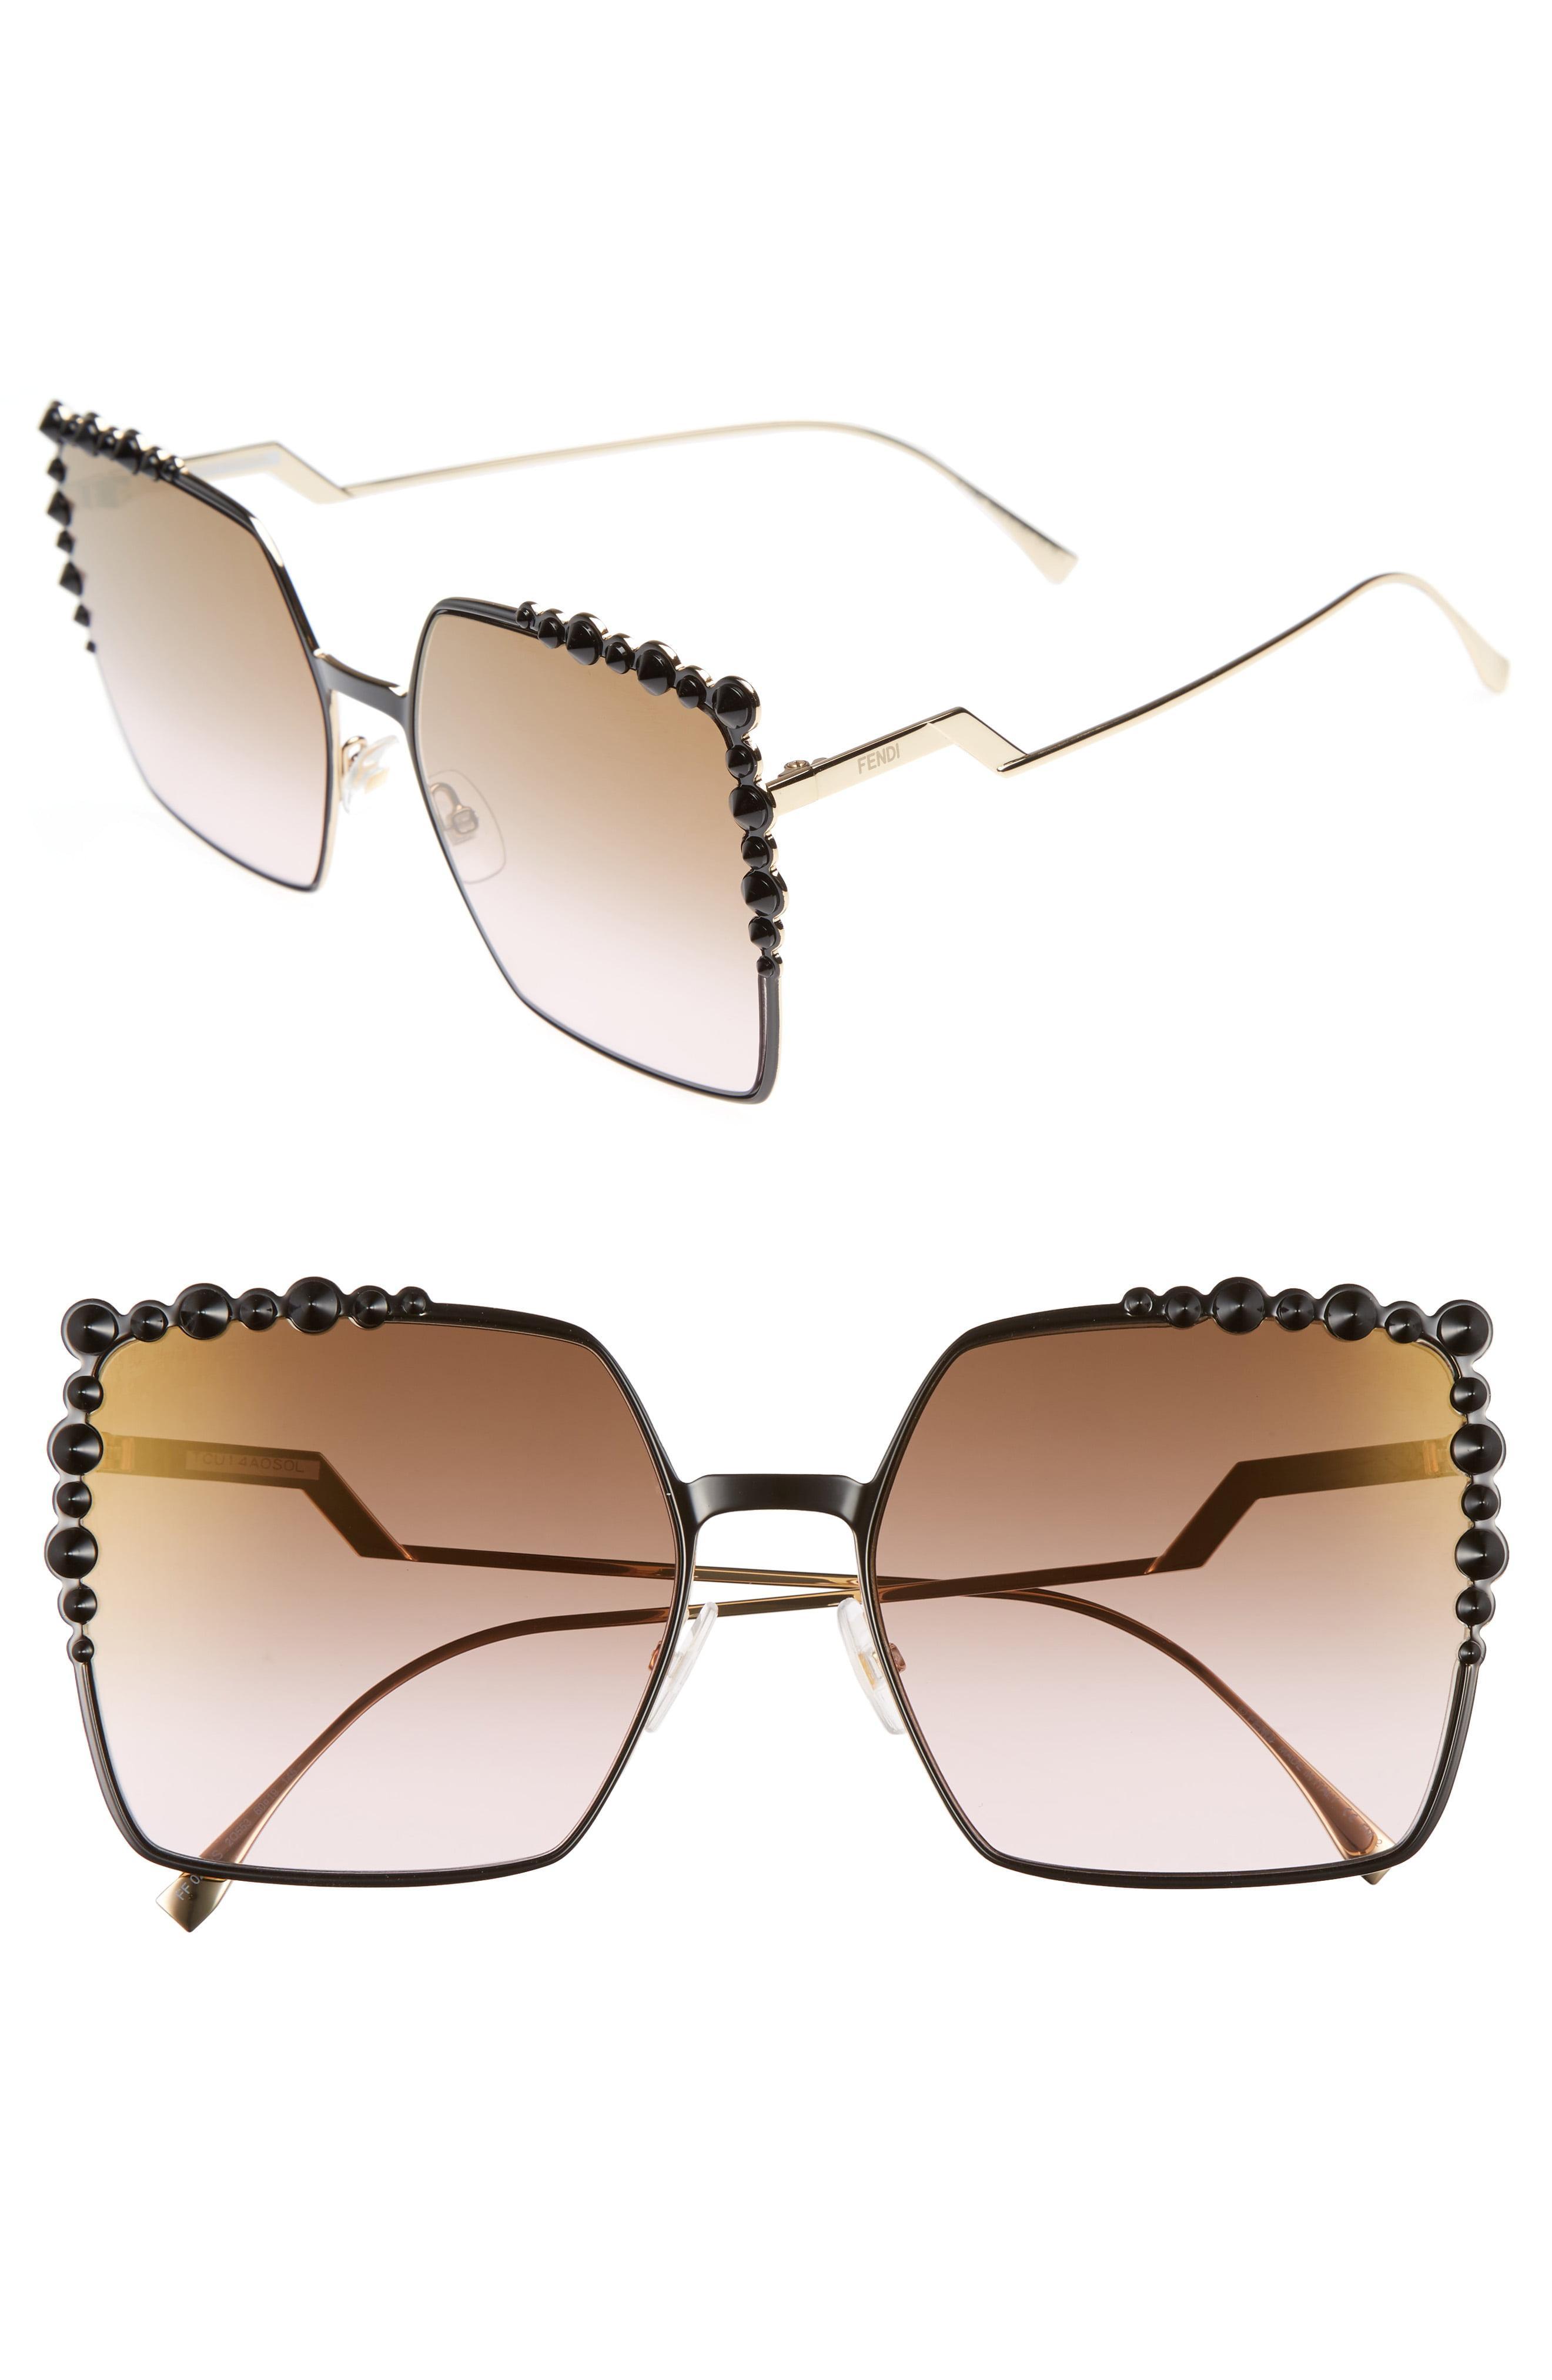 45b0c3b07703 Fendi - Brown 60mm Gradient Square Cat Eye Sunglasses - - Lyst. View  fullscreen